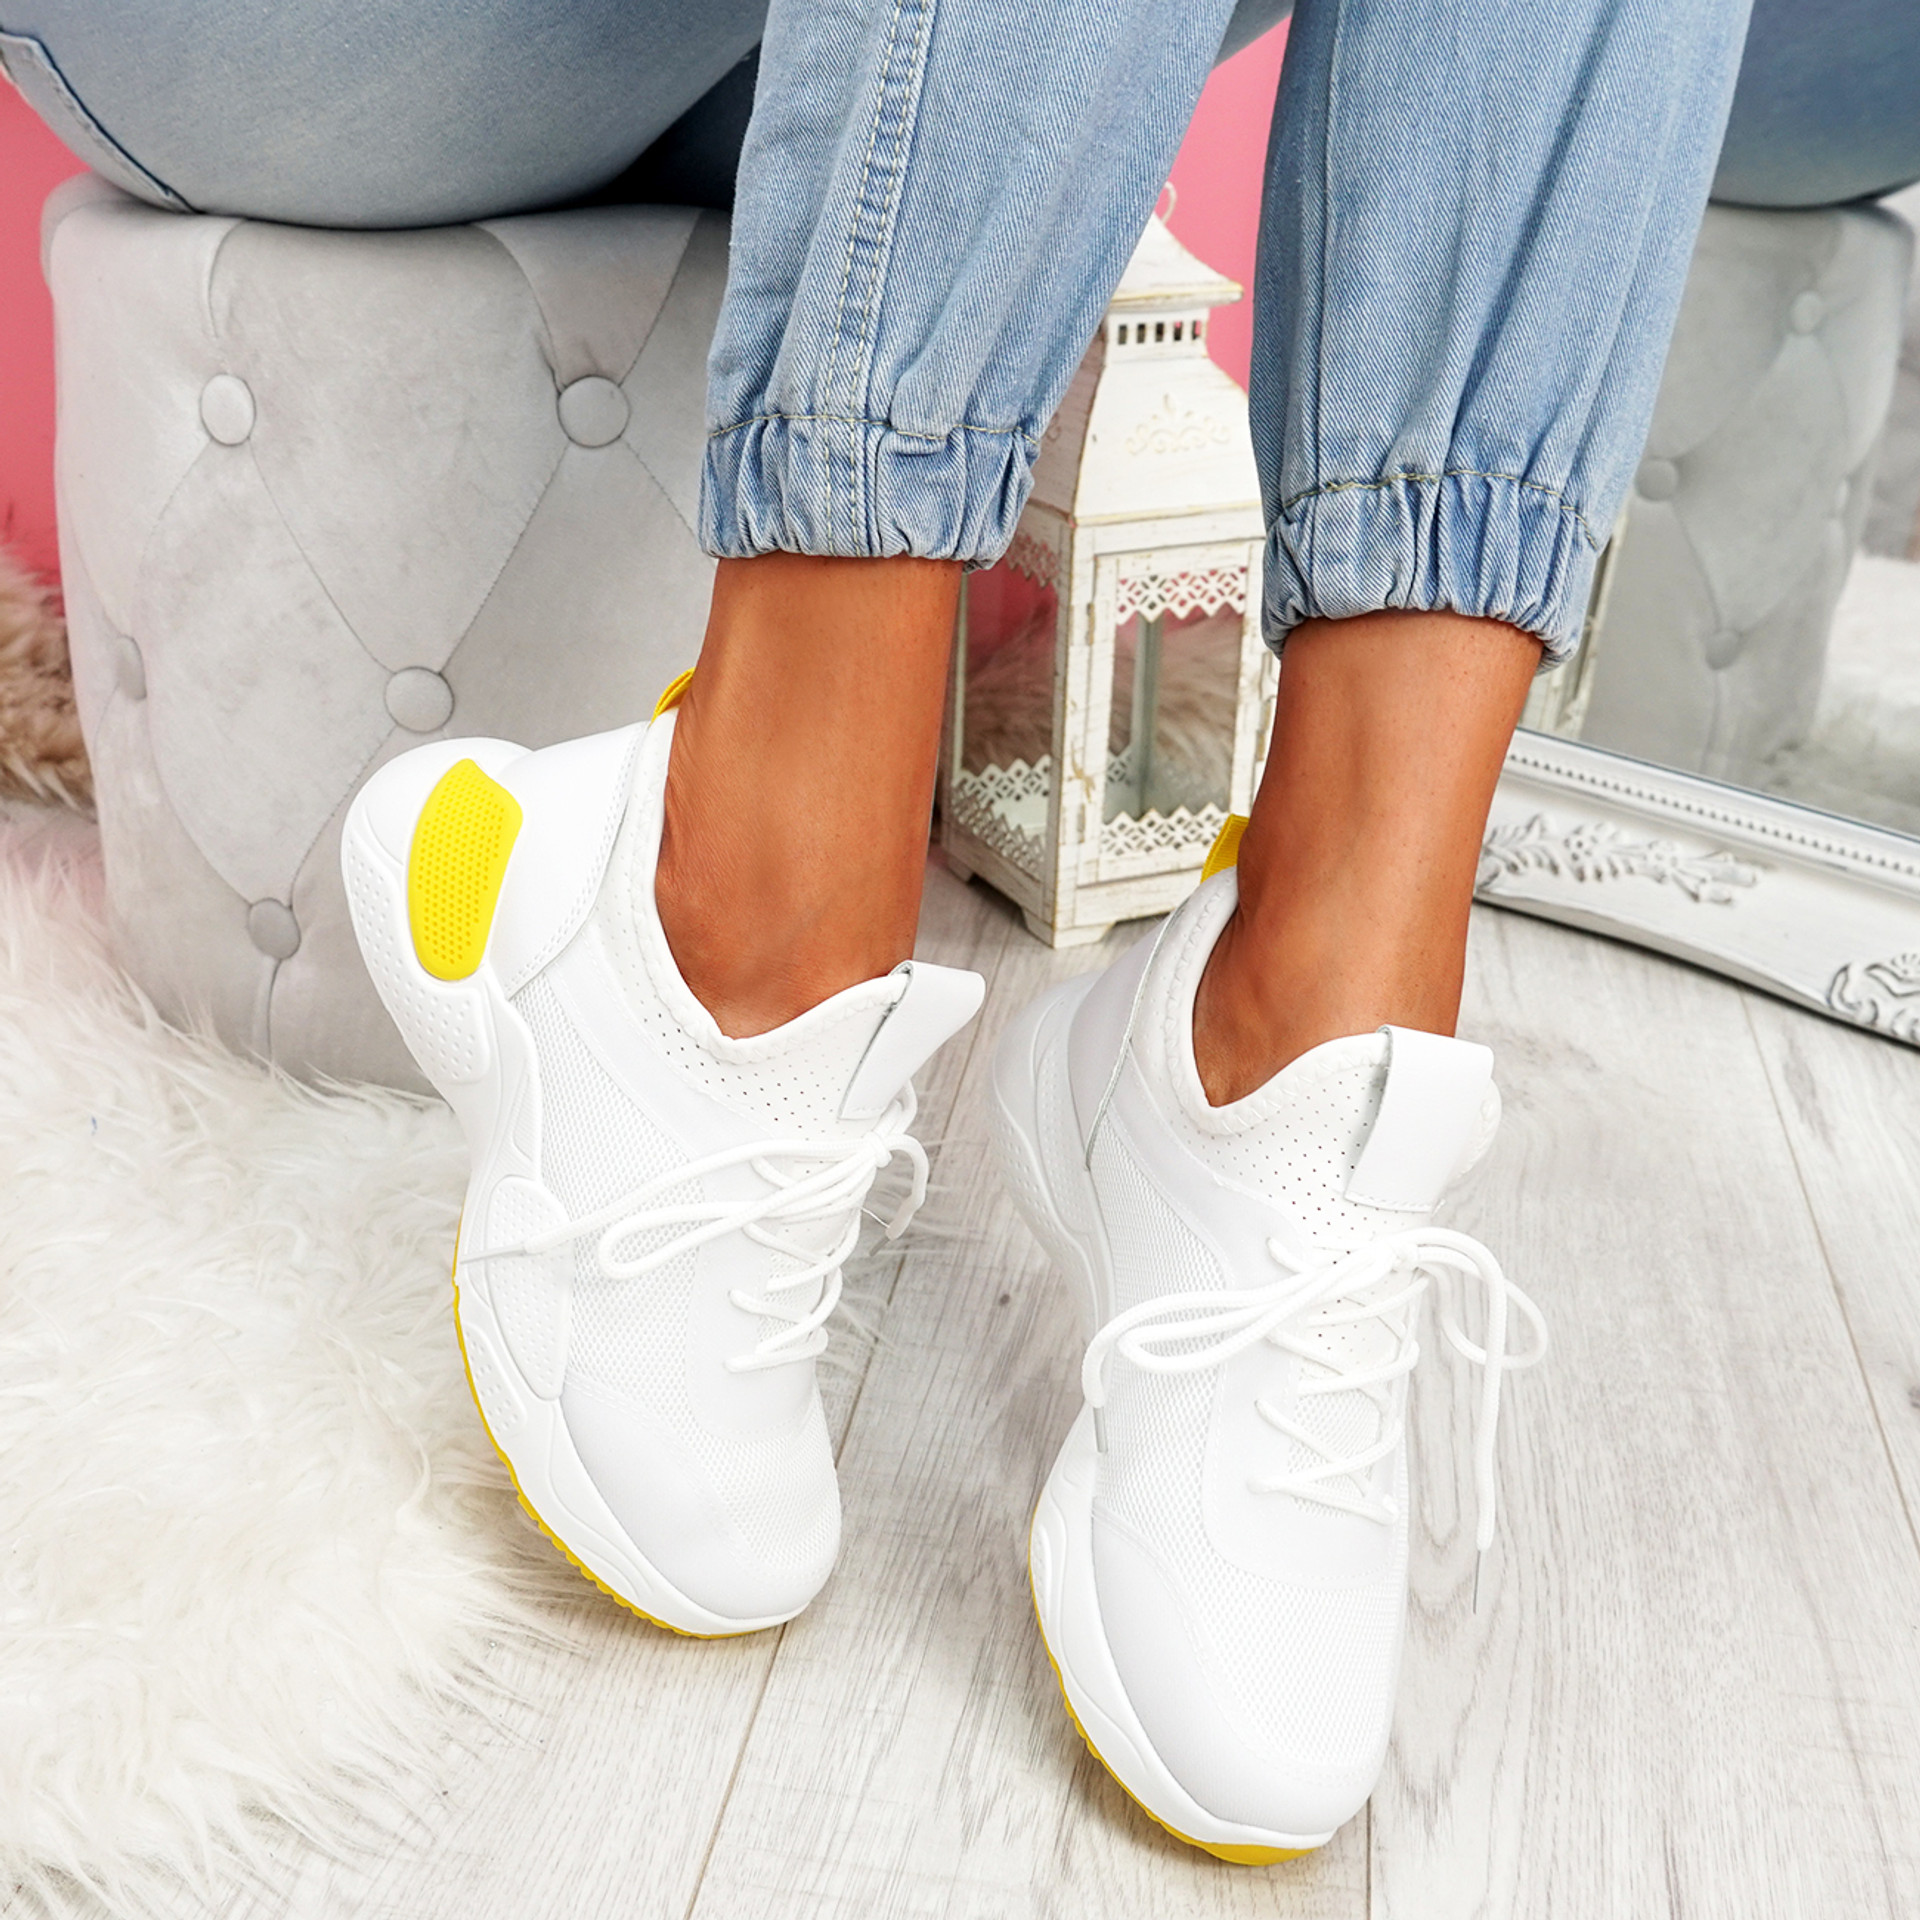 Lomy White Yellow Chunky Trainers